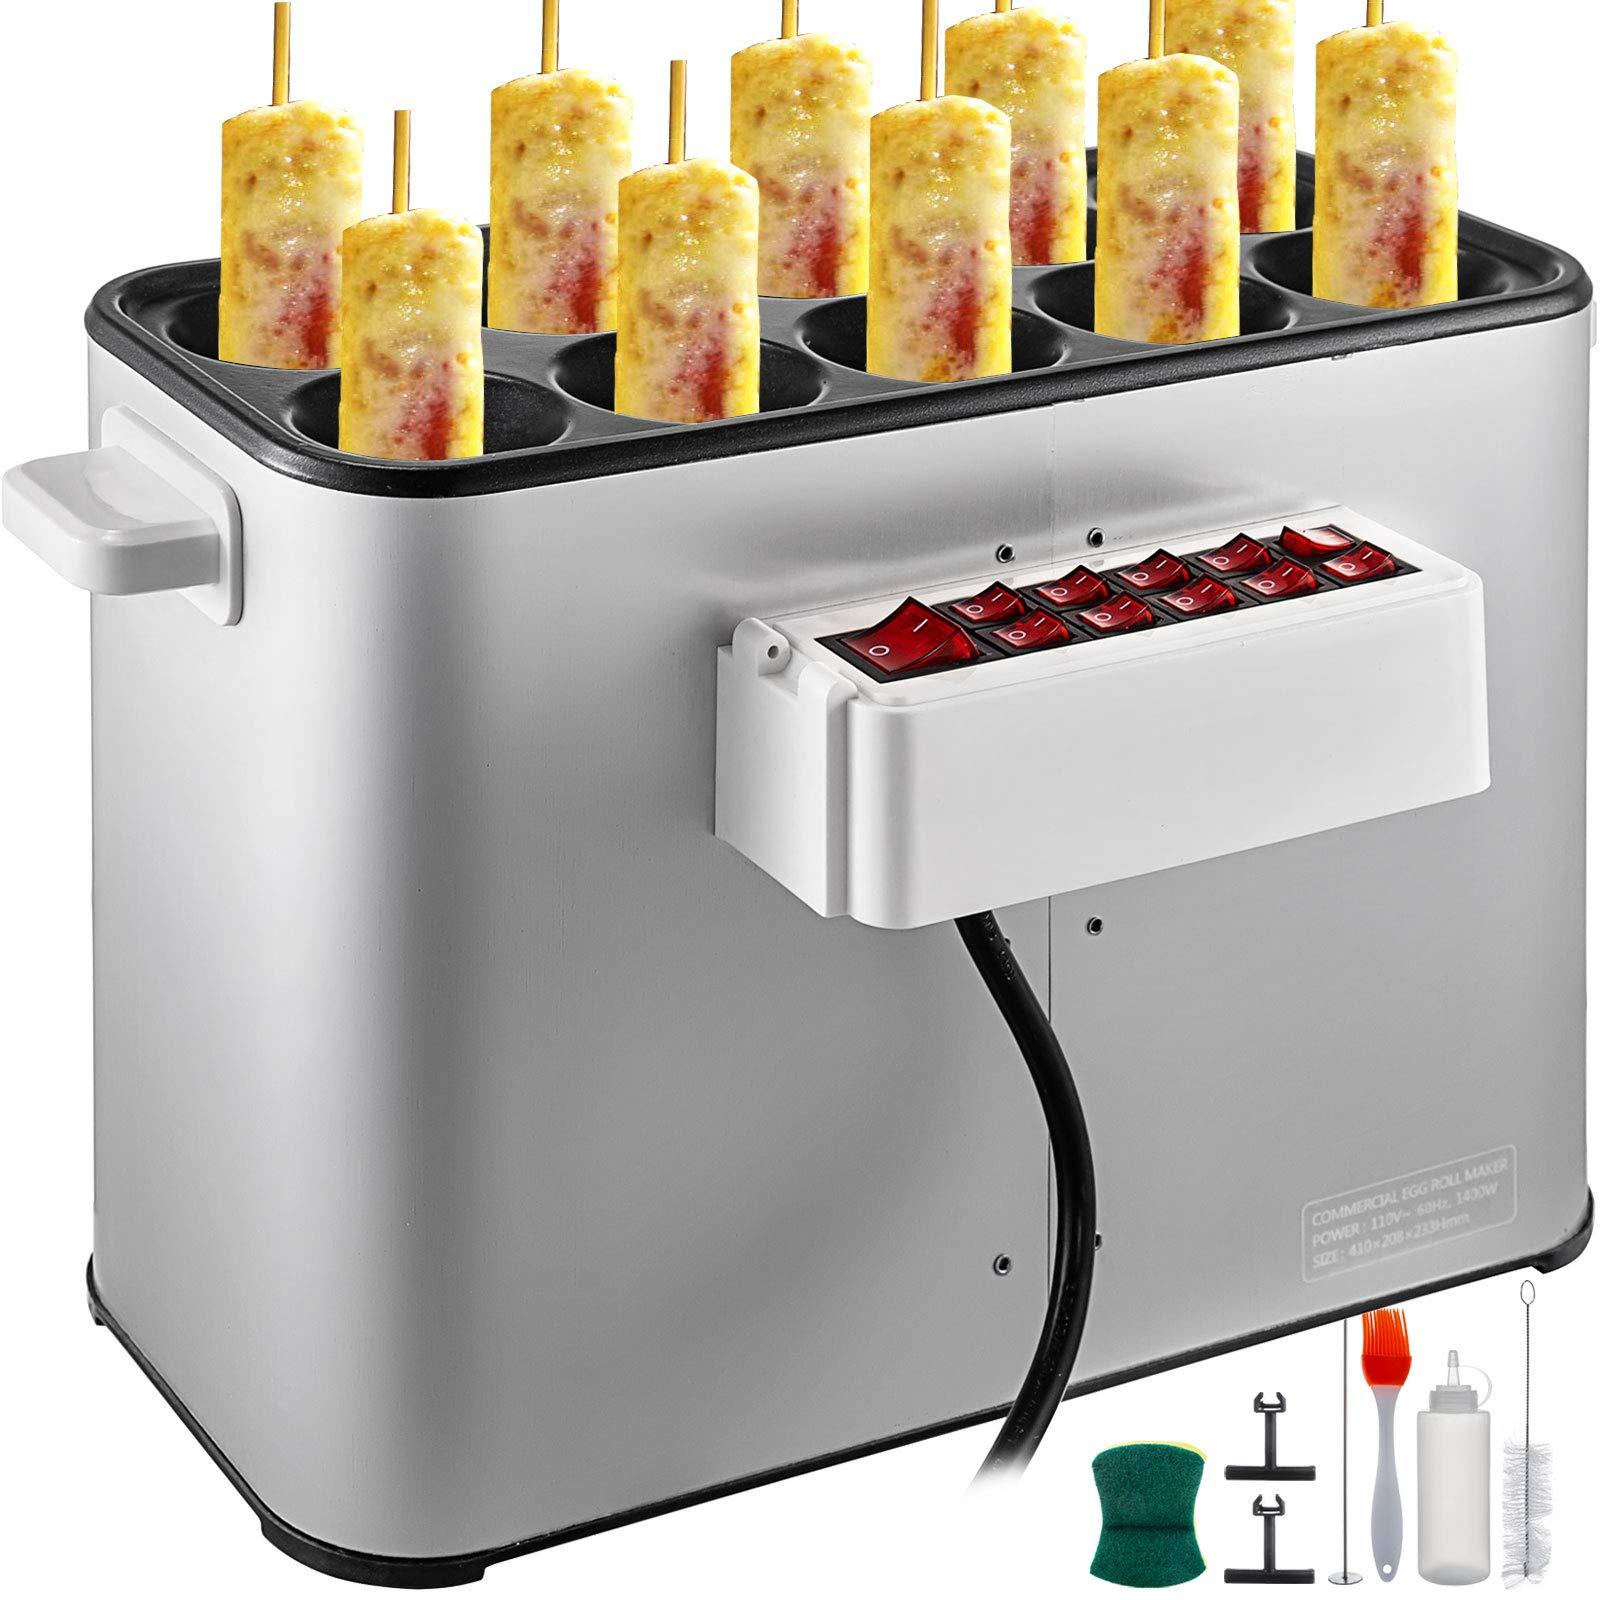 VBENLEM Automatic Egg Roll Machine 1400W Electric Automatic Egg Roll Machine 110V Home DIY Commercial Hot Dog Roll Maker Machine for Breakfast by VBENLEM